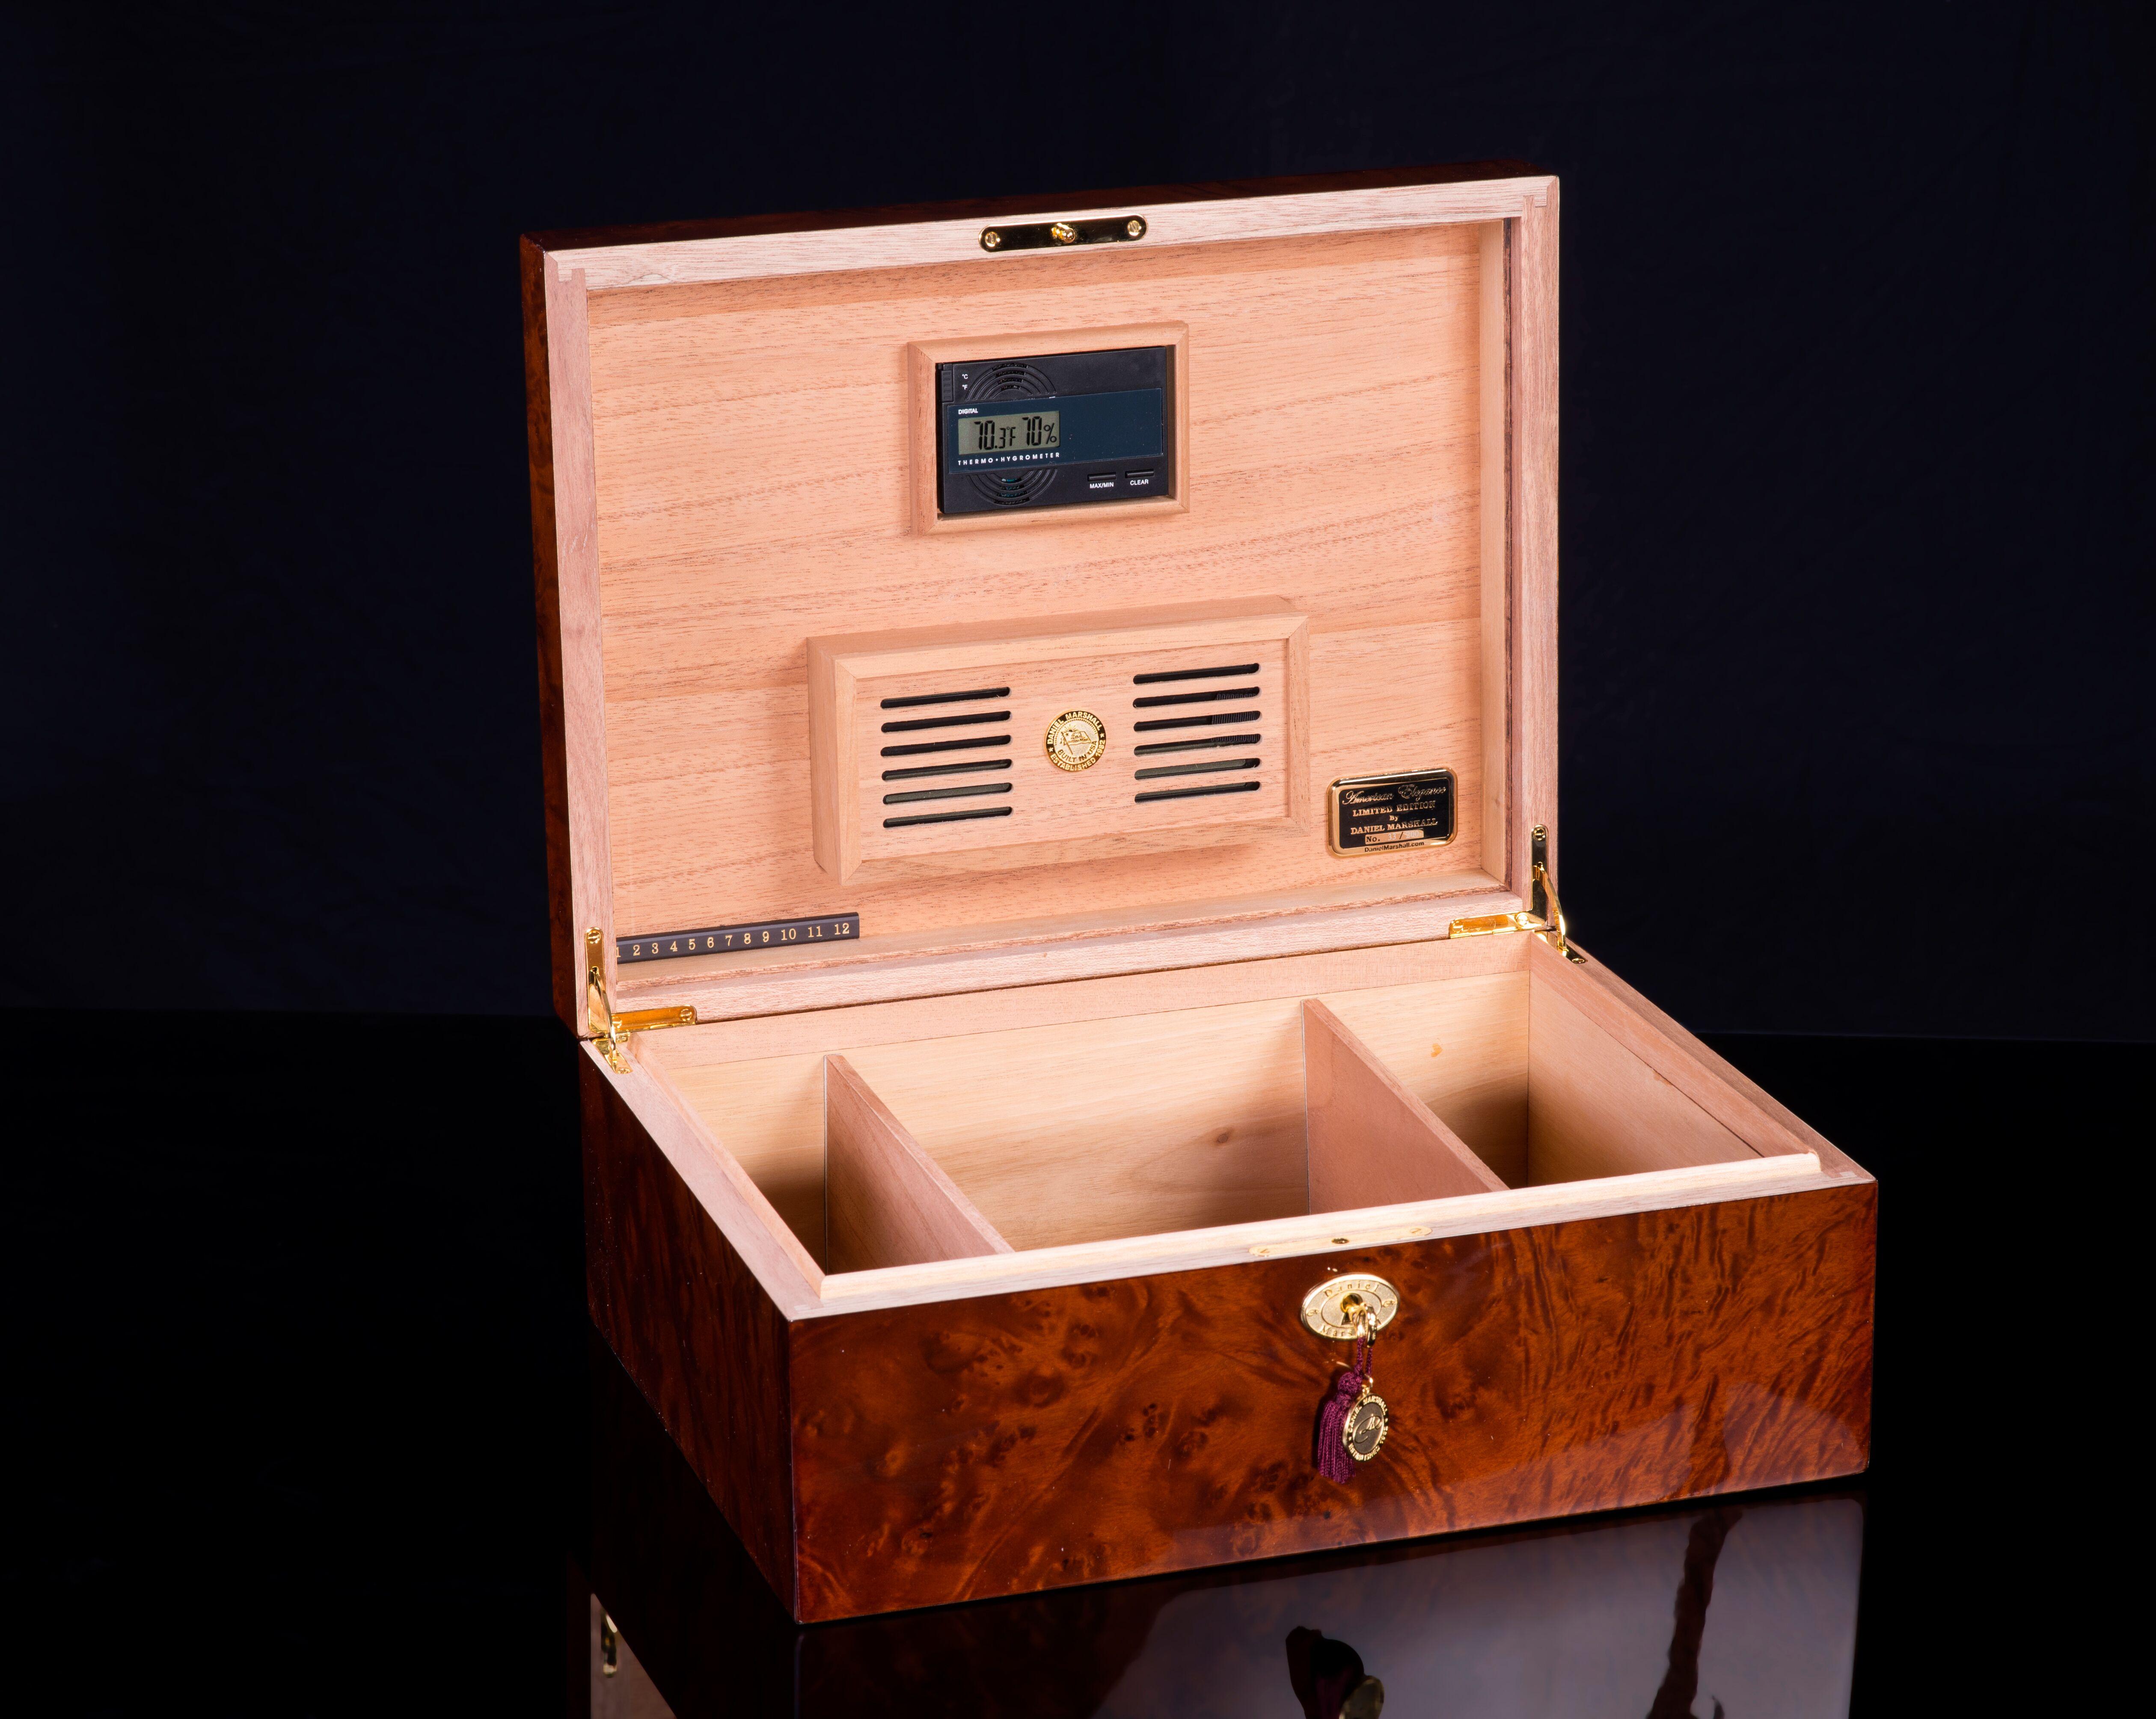 daniel marshall 200165.3 cigar humidor box